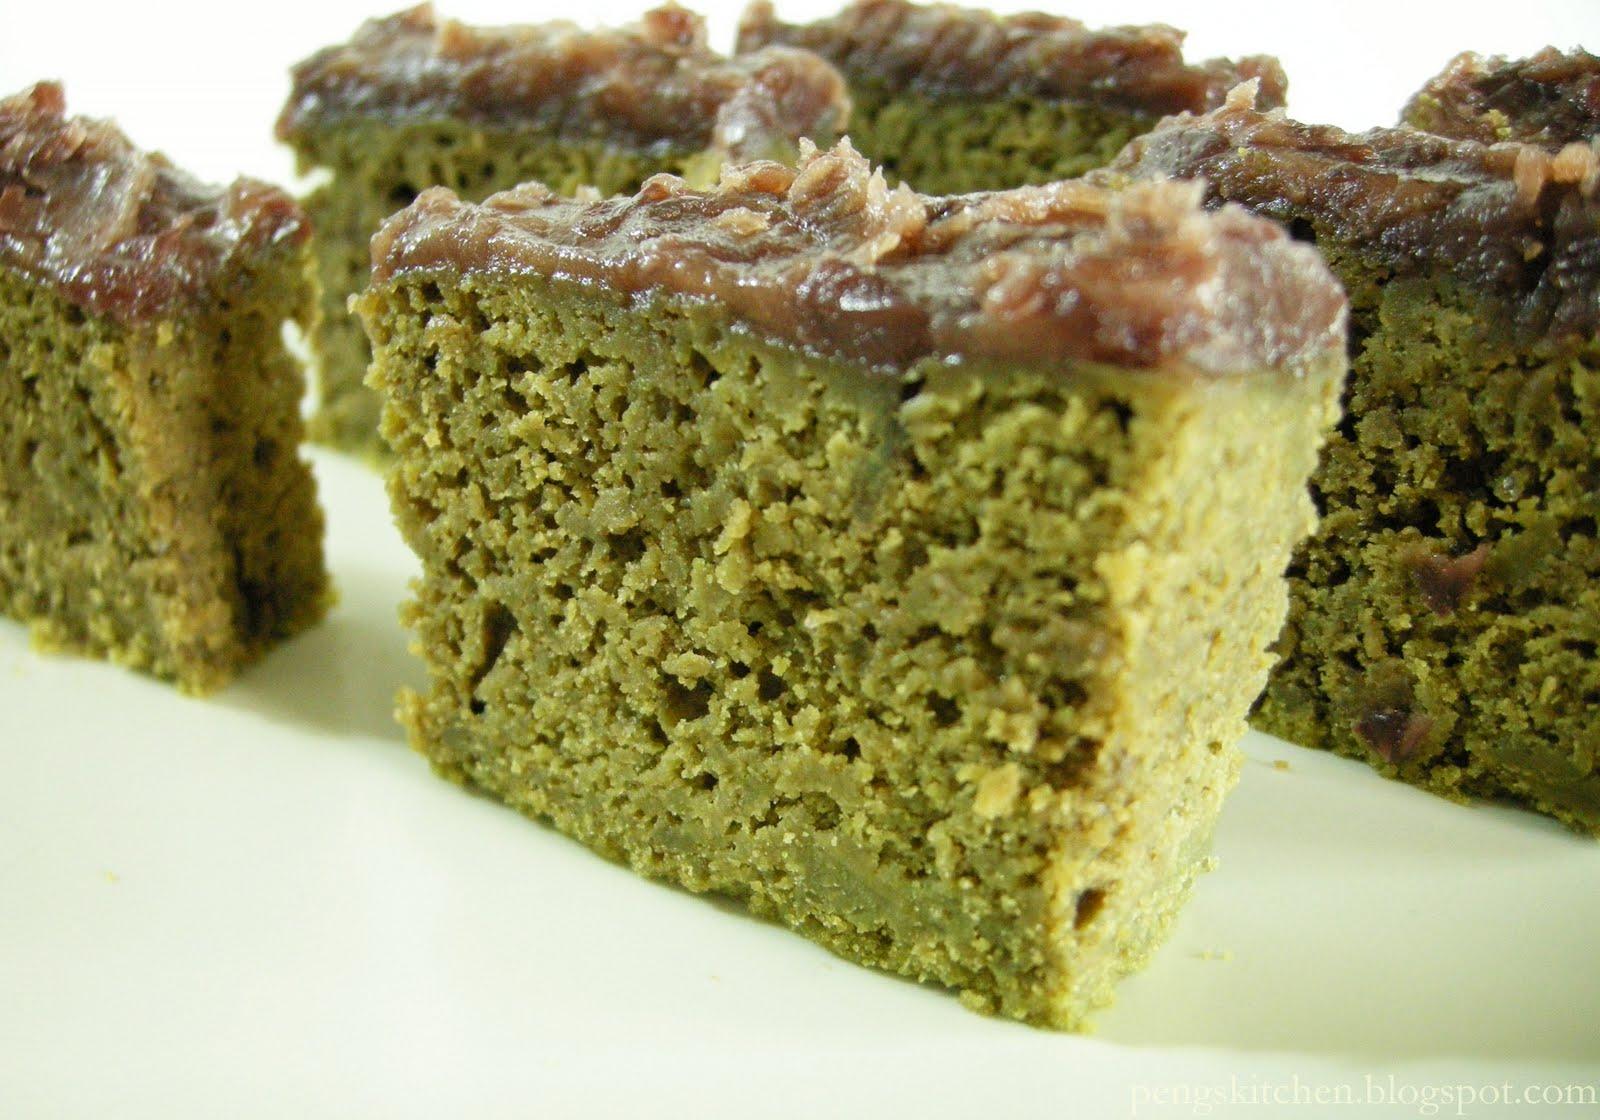 Green Tea Cake Recipe Japanese: Peng's Kitchen: Steamed Matcha Cake